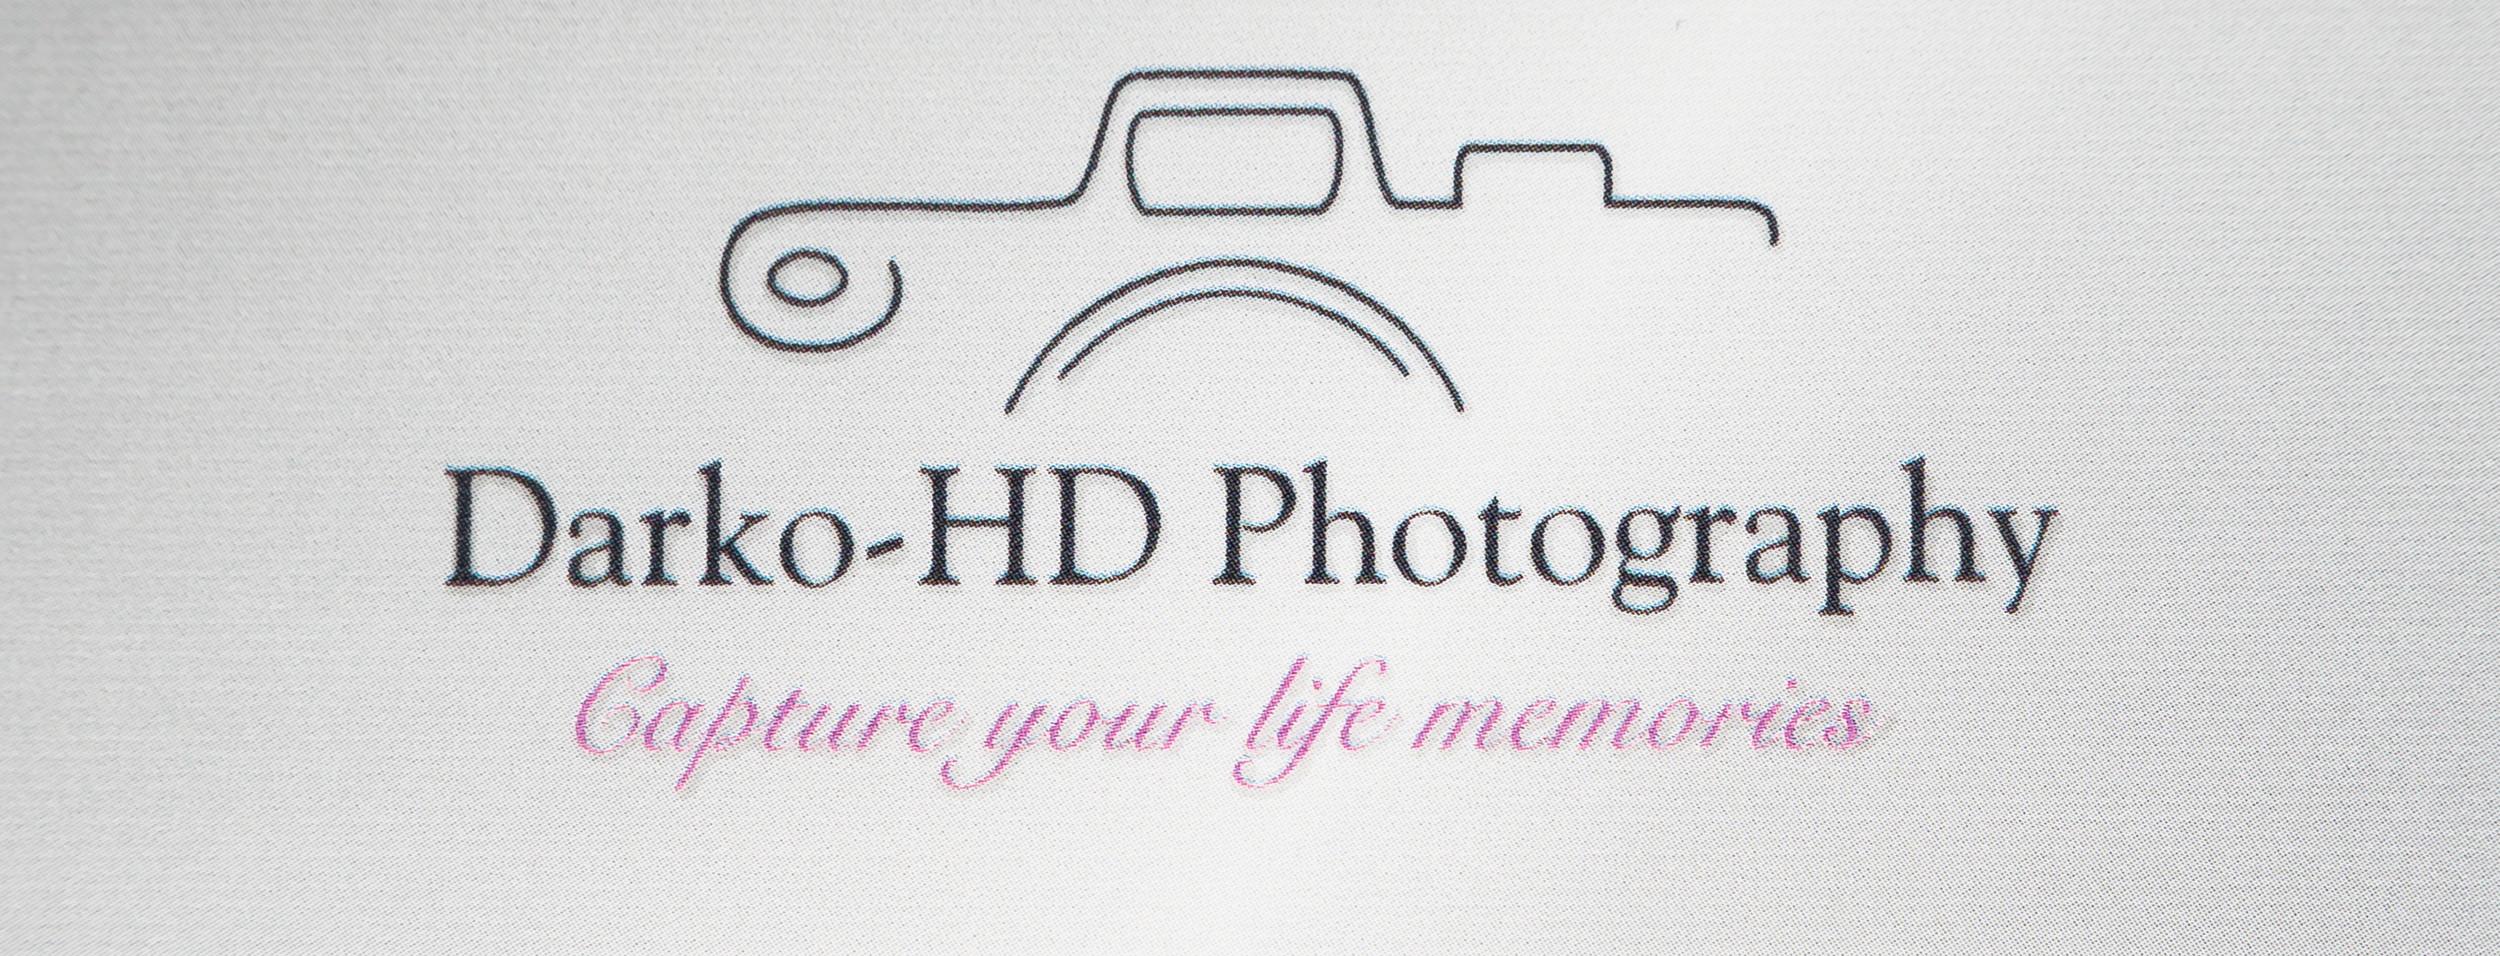 Calgary Portrait & Wedding Photographer | Darko-HD Photography